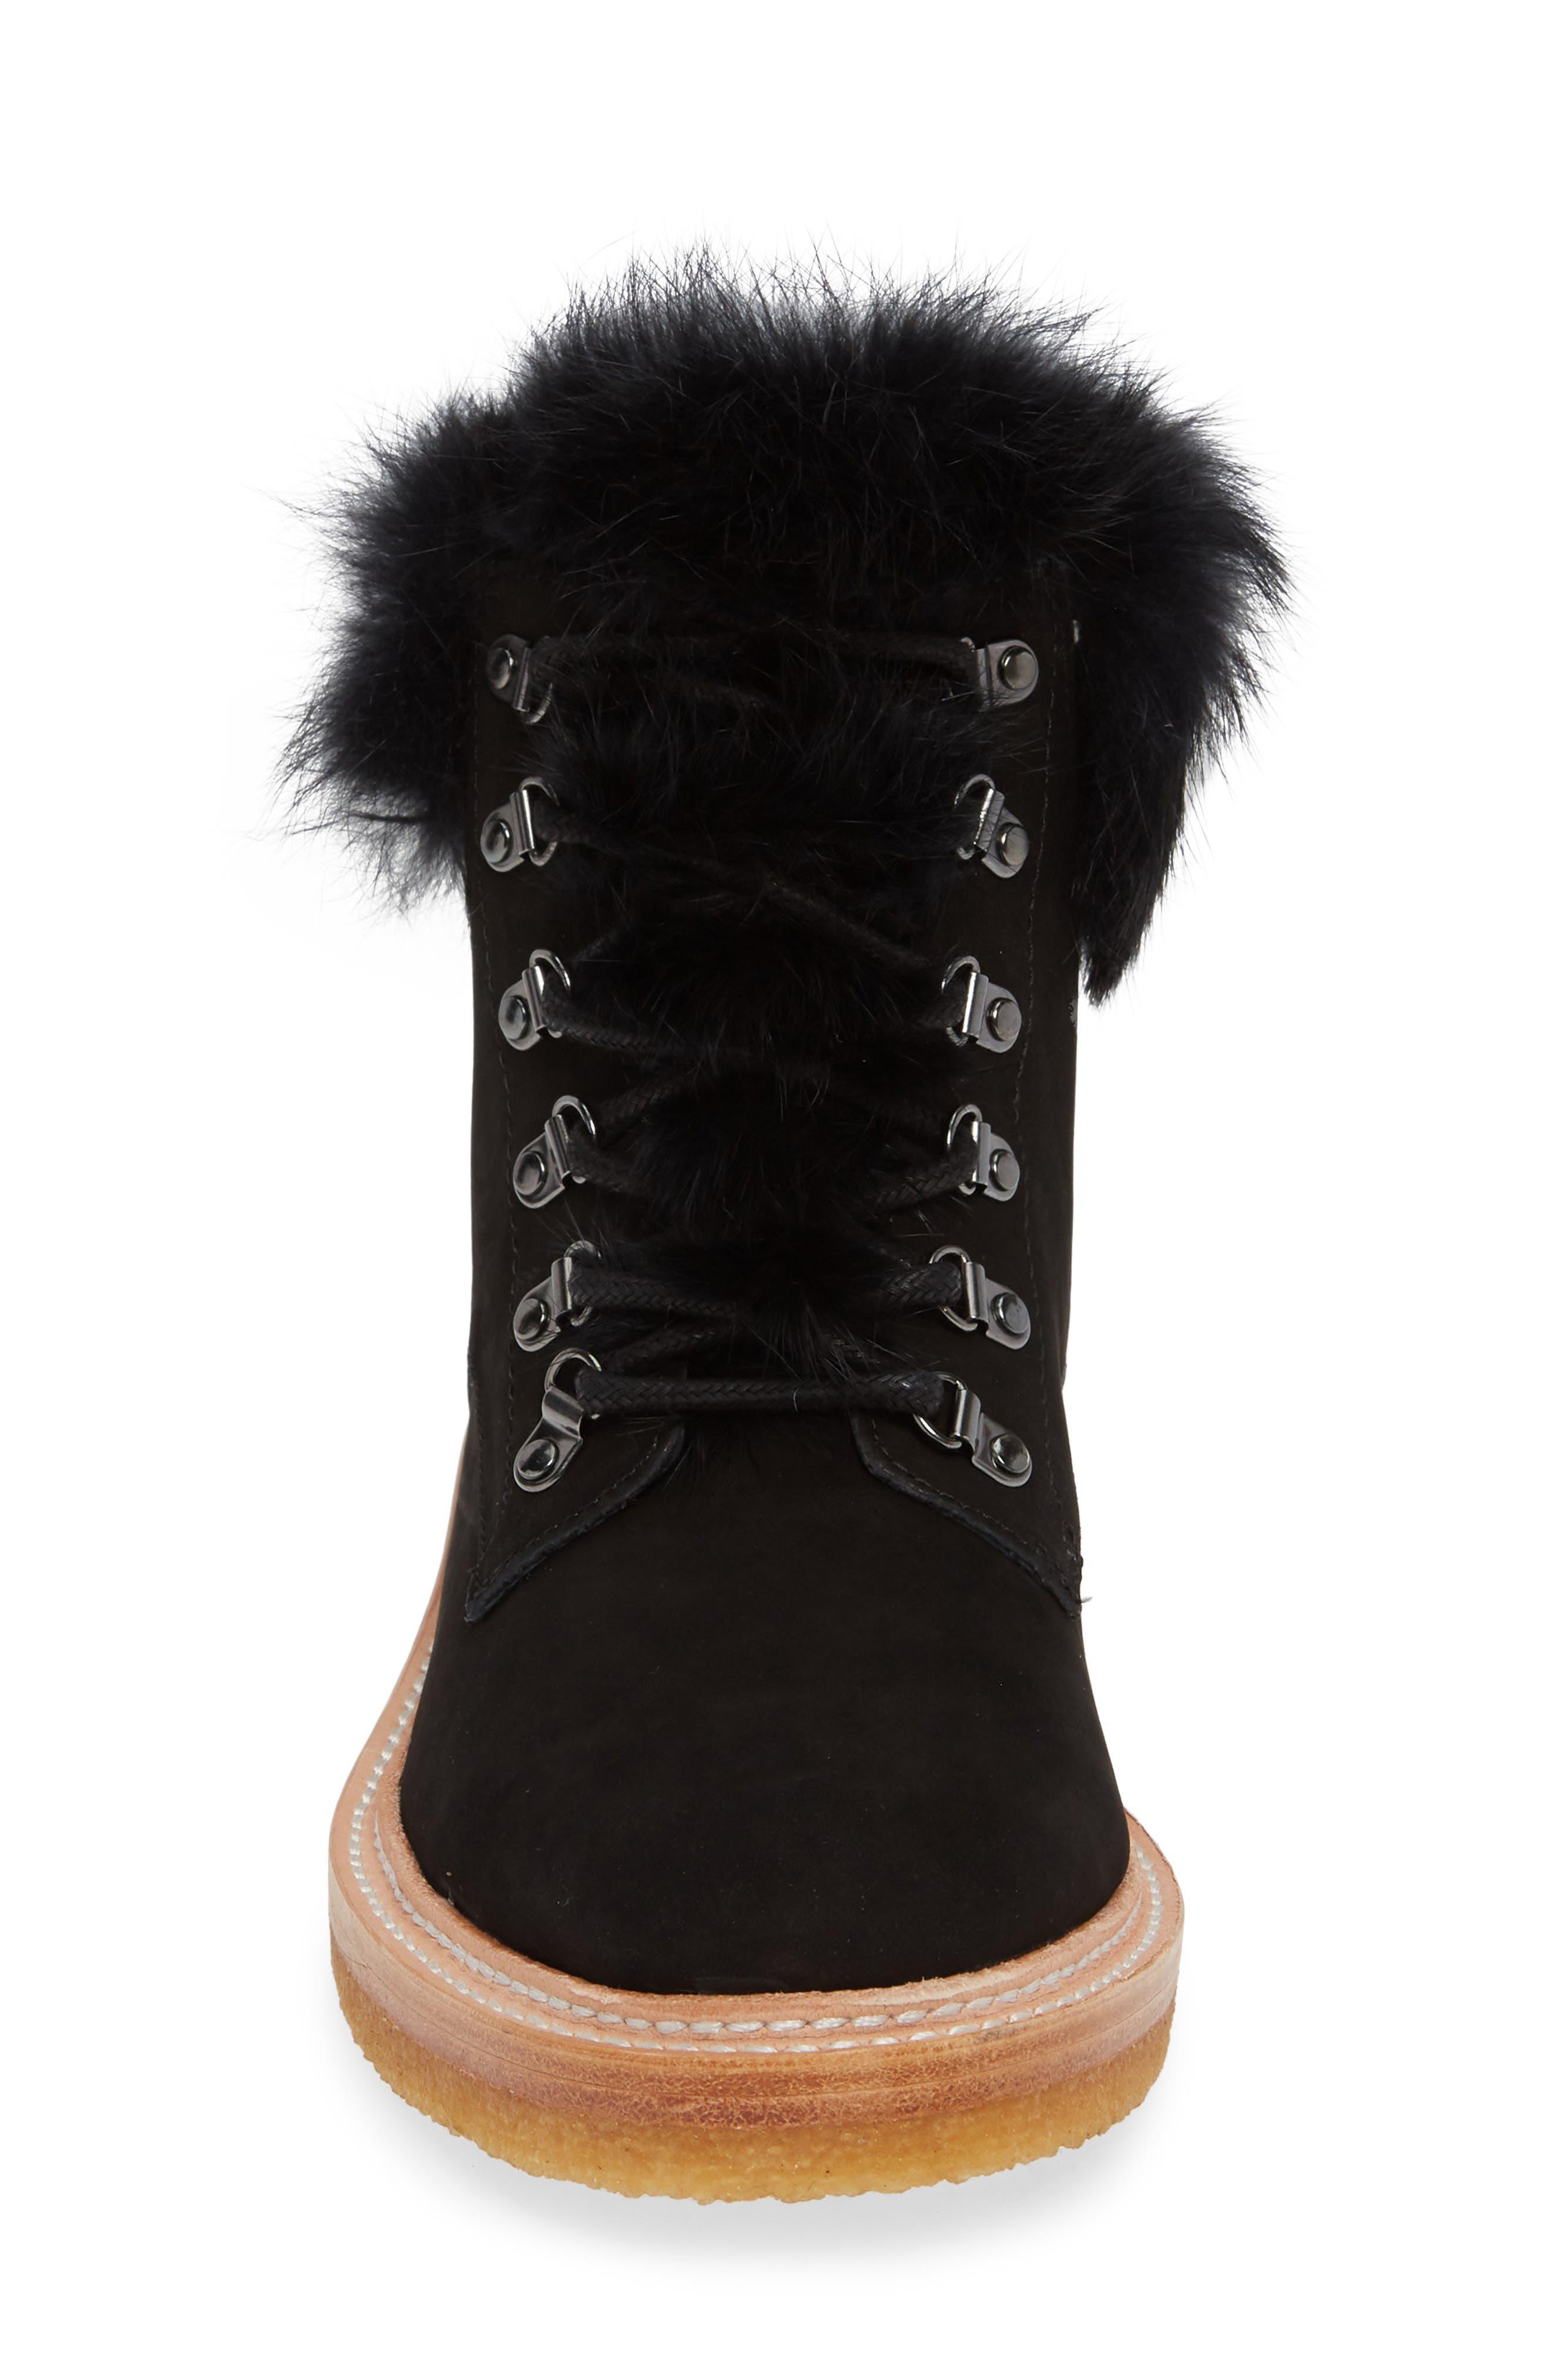 BOTKIER,                             Winter Genuine Rabbit Fur Trim Boot,                             Alternate thumbnail 4, color,                             BLACK SUEDE